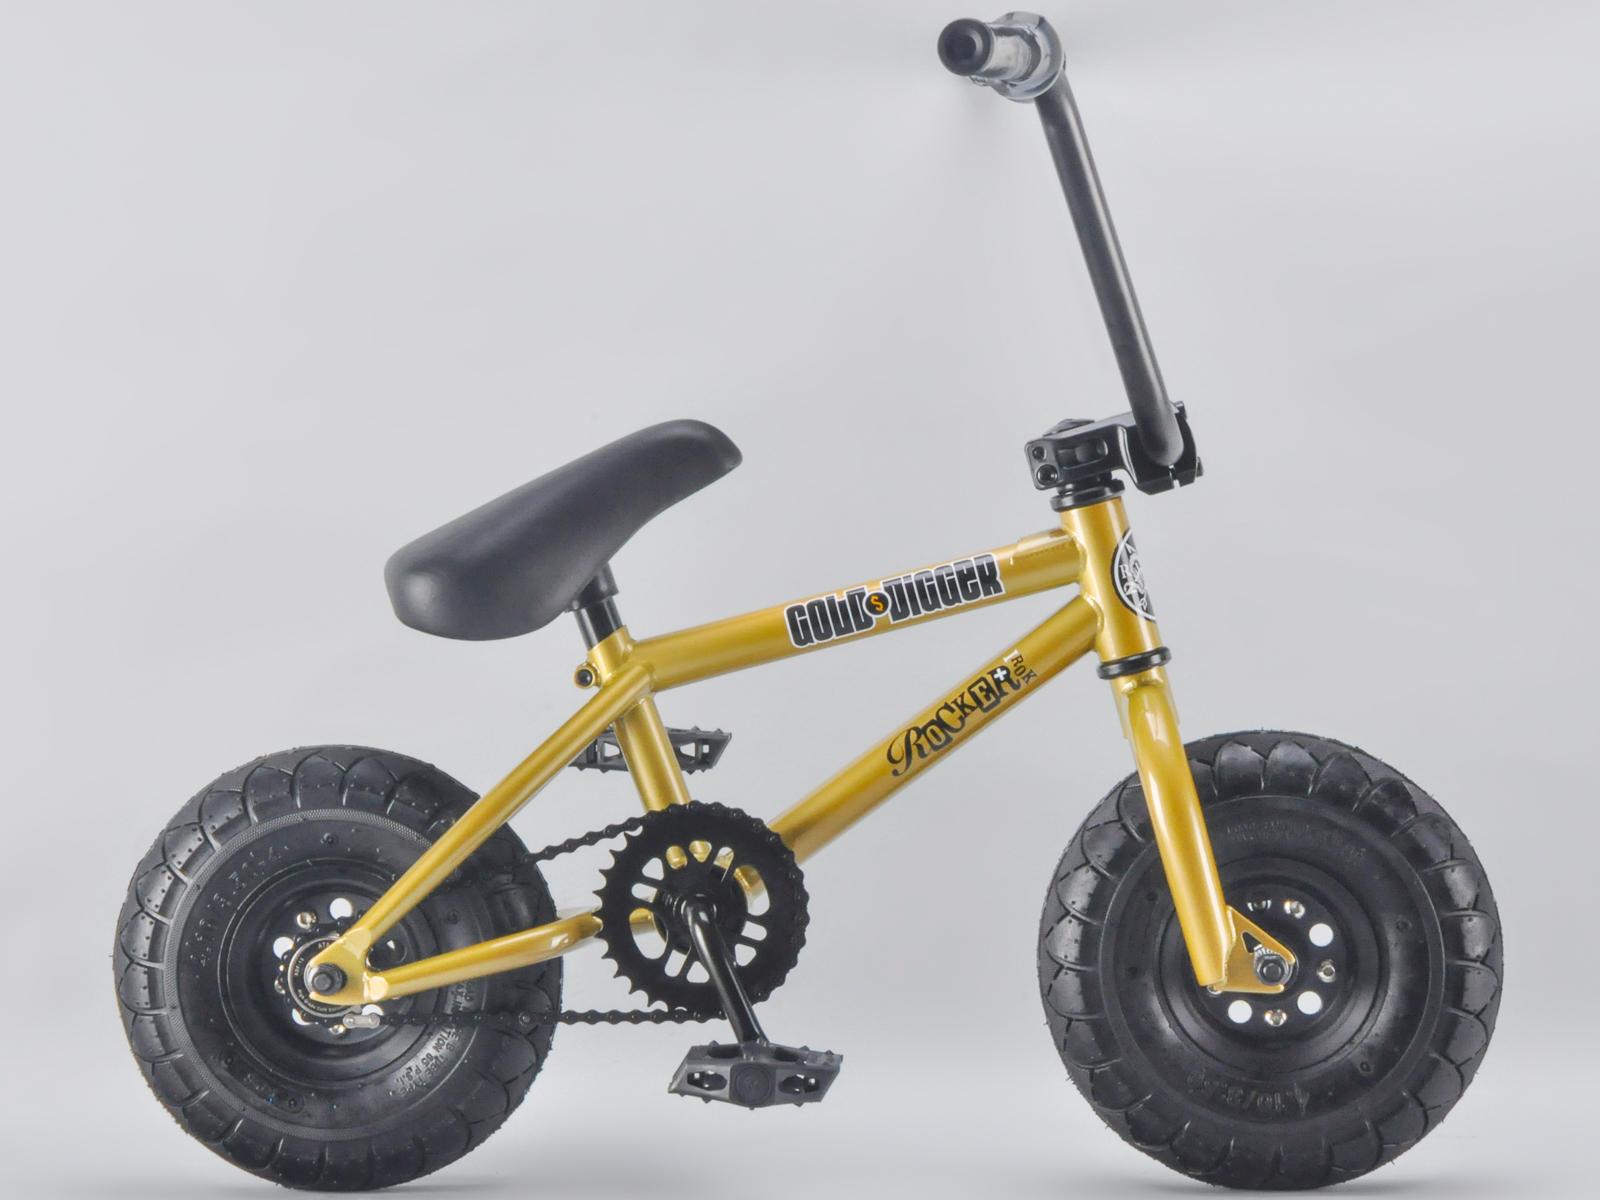 rocker bmx mini bmx bike gold digger irok rkr ebay. Black Bedroom Furniture Sets. Home Design Ideas